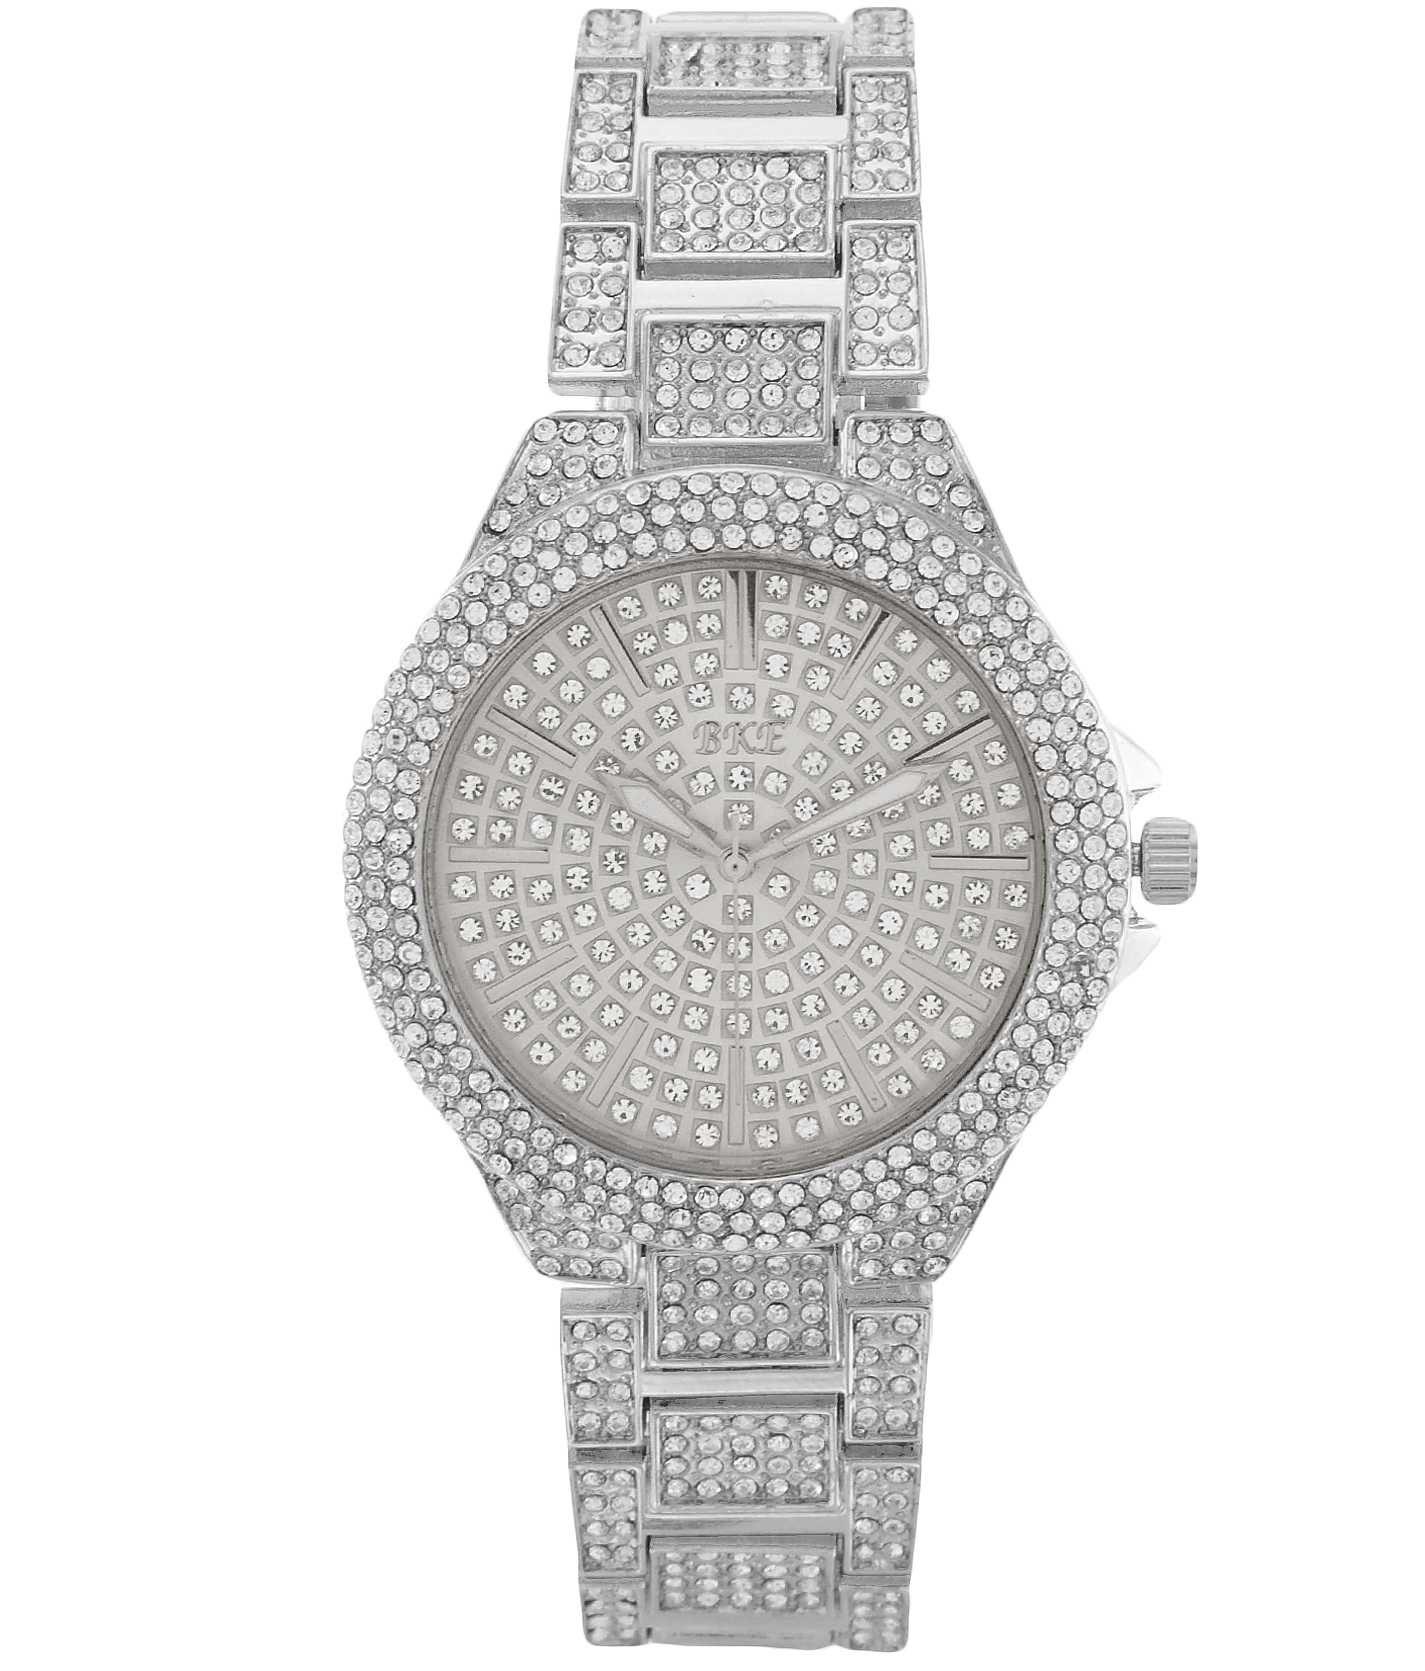 BKE Glitz Watch - Women's Watches | Buckle | Bling.Bling ...